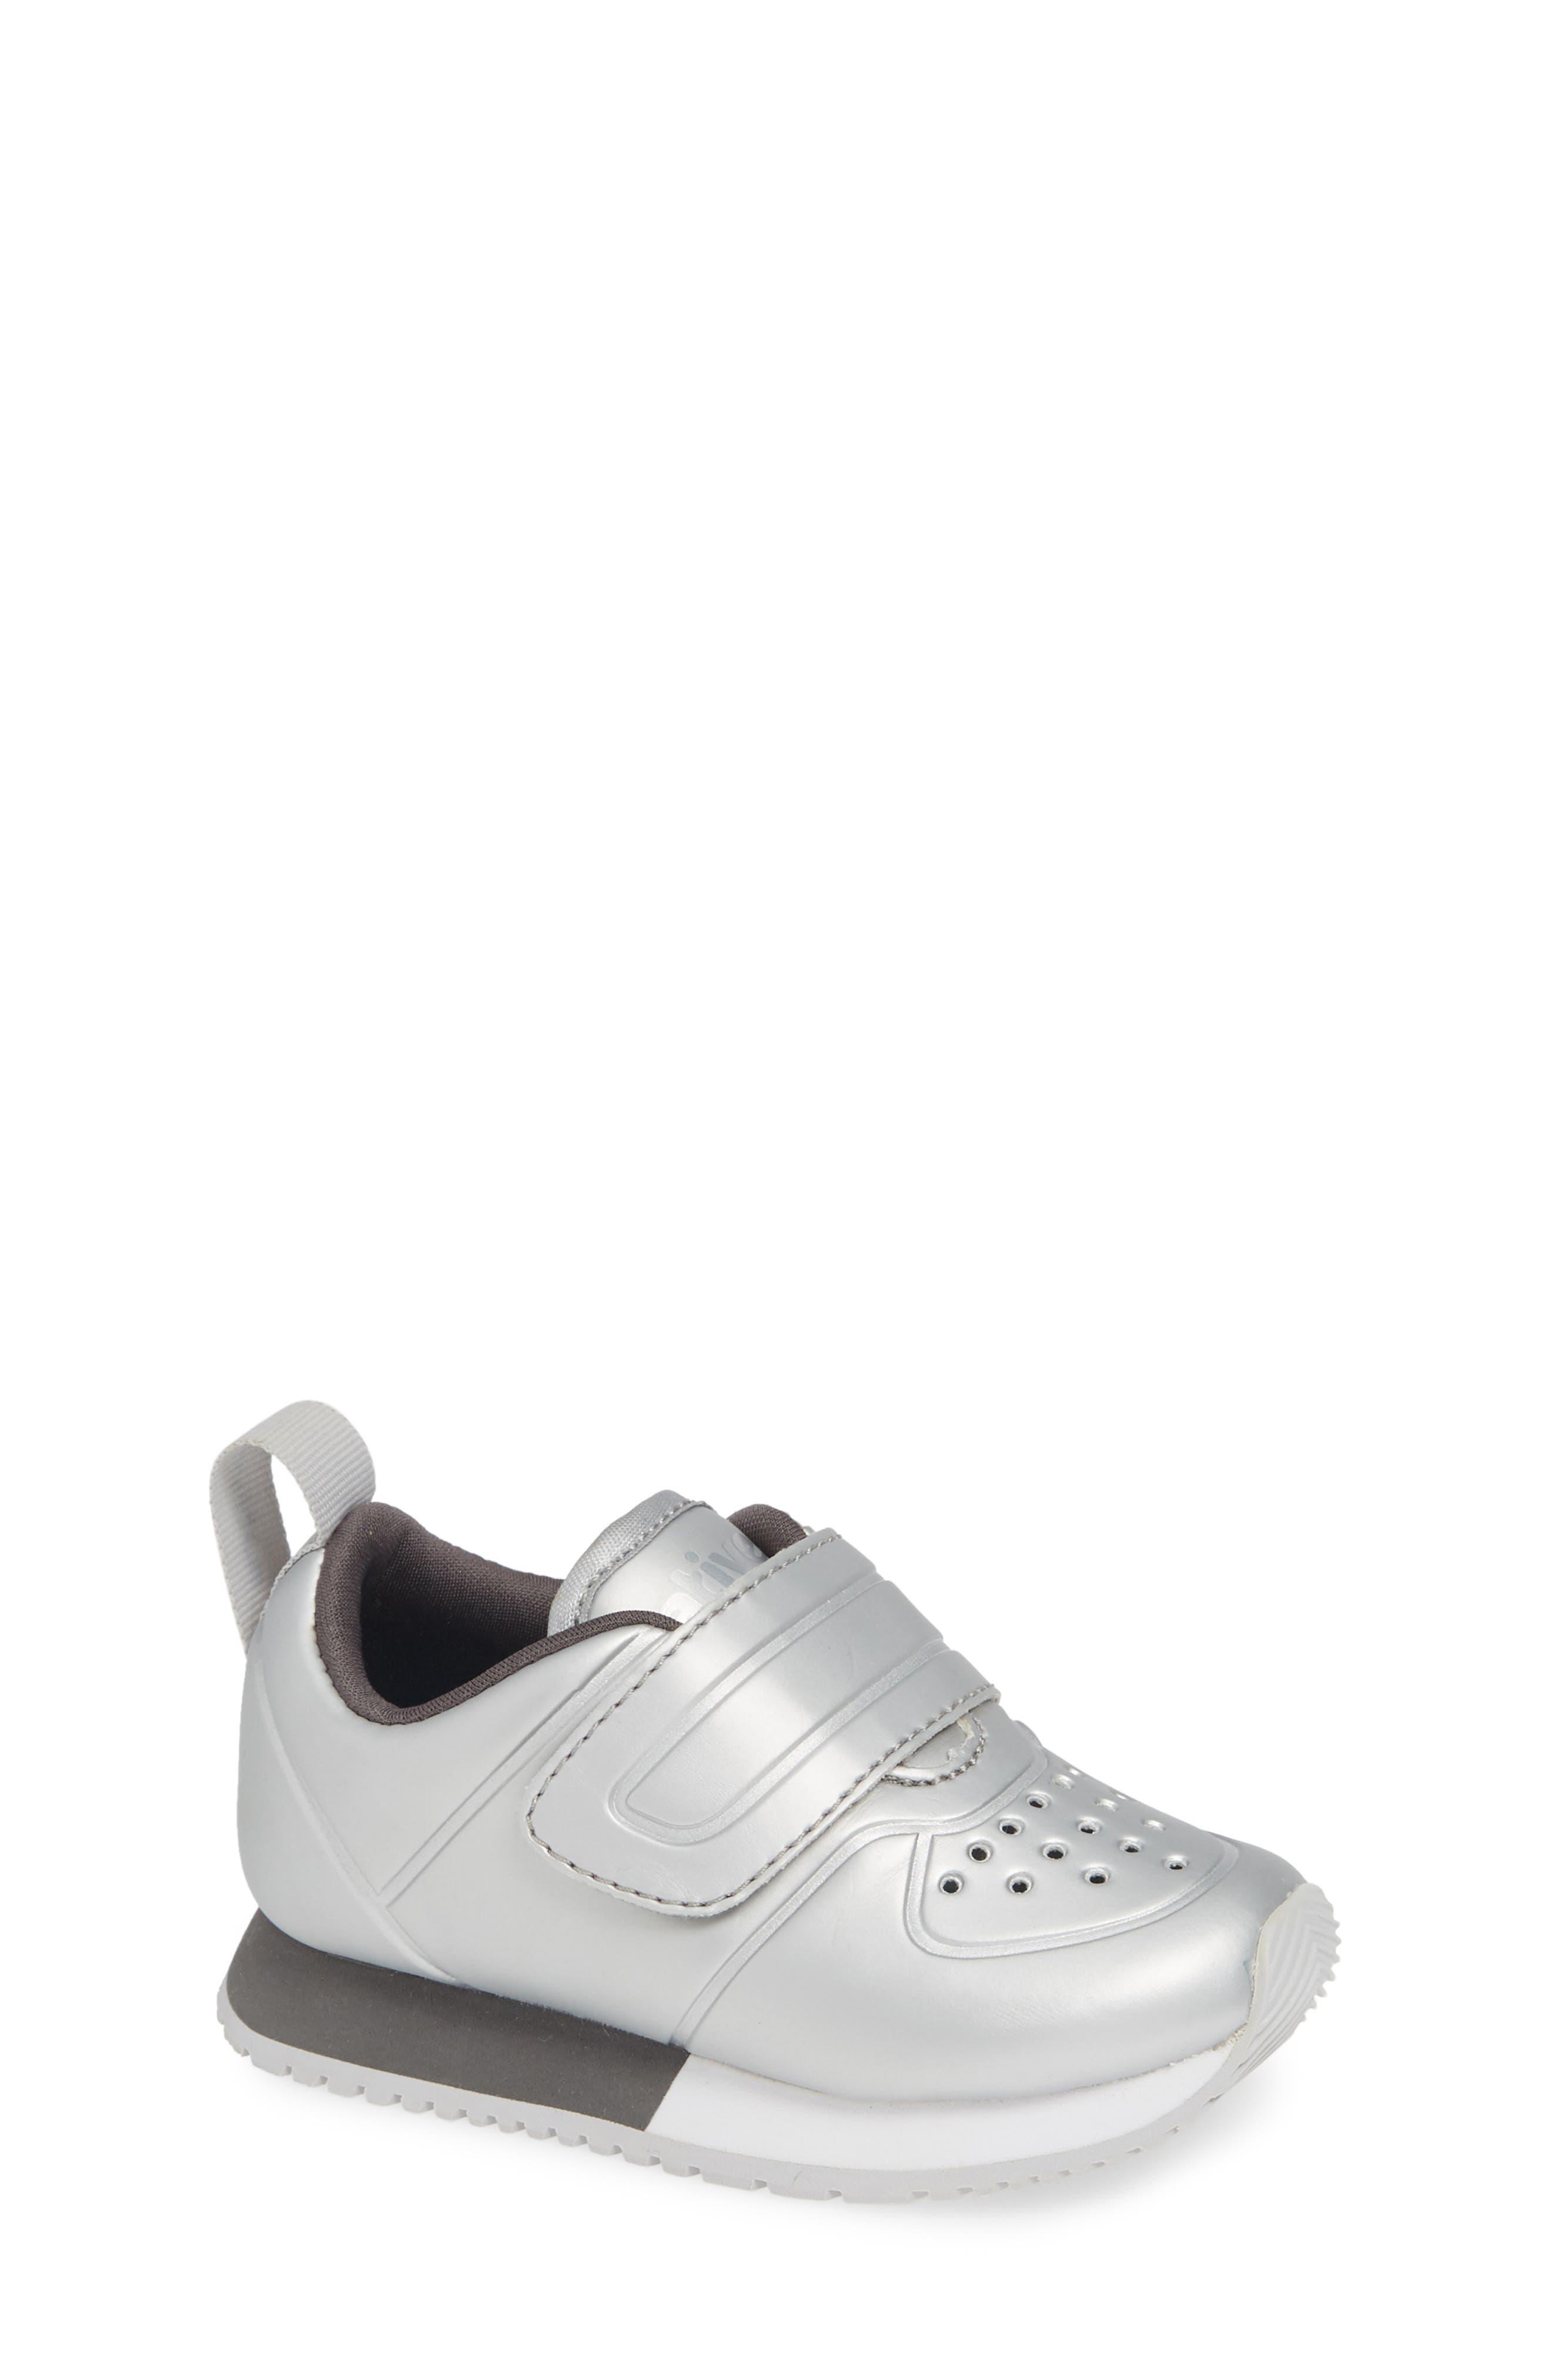 Cornell Perforated Metallic Sneaker,                             Main thumbnail 1, color,                             SILVER/ WHITE/ DUBLIN GREY